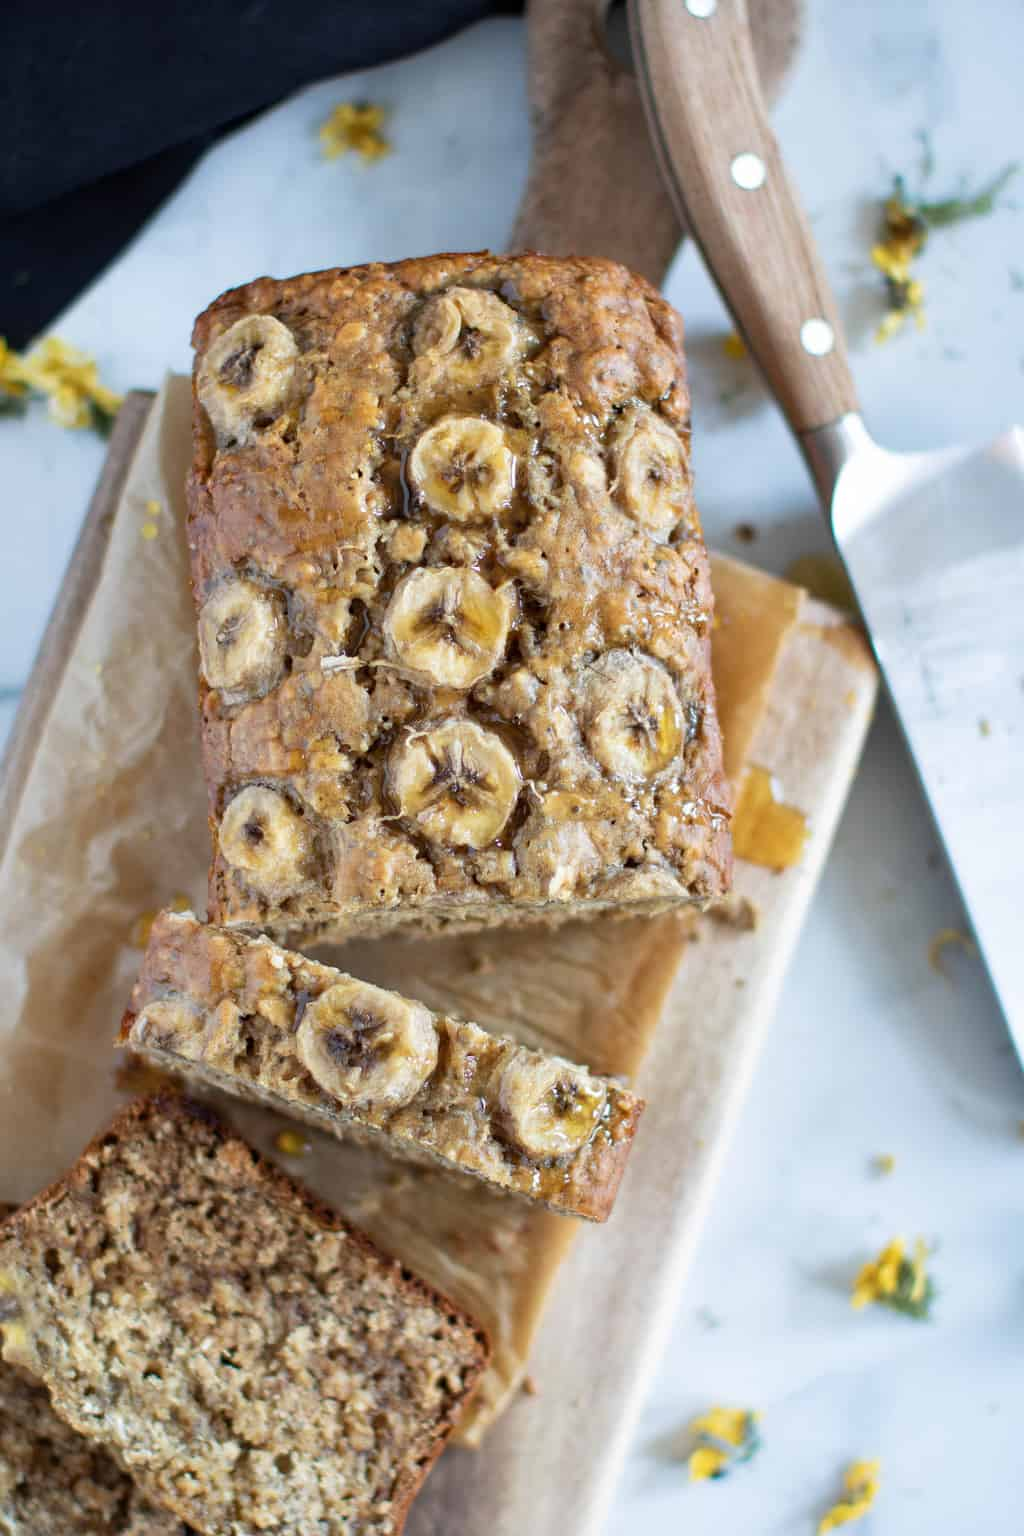 Vegan Chia Seed Maple Banana Bread